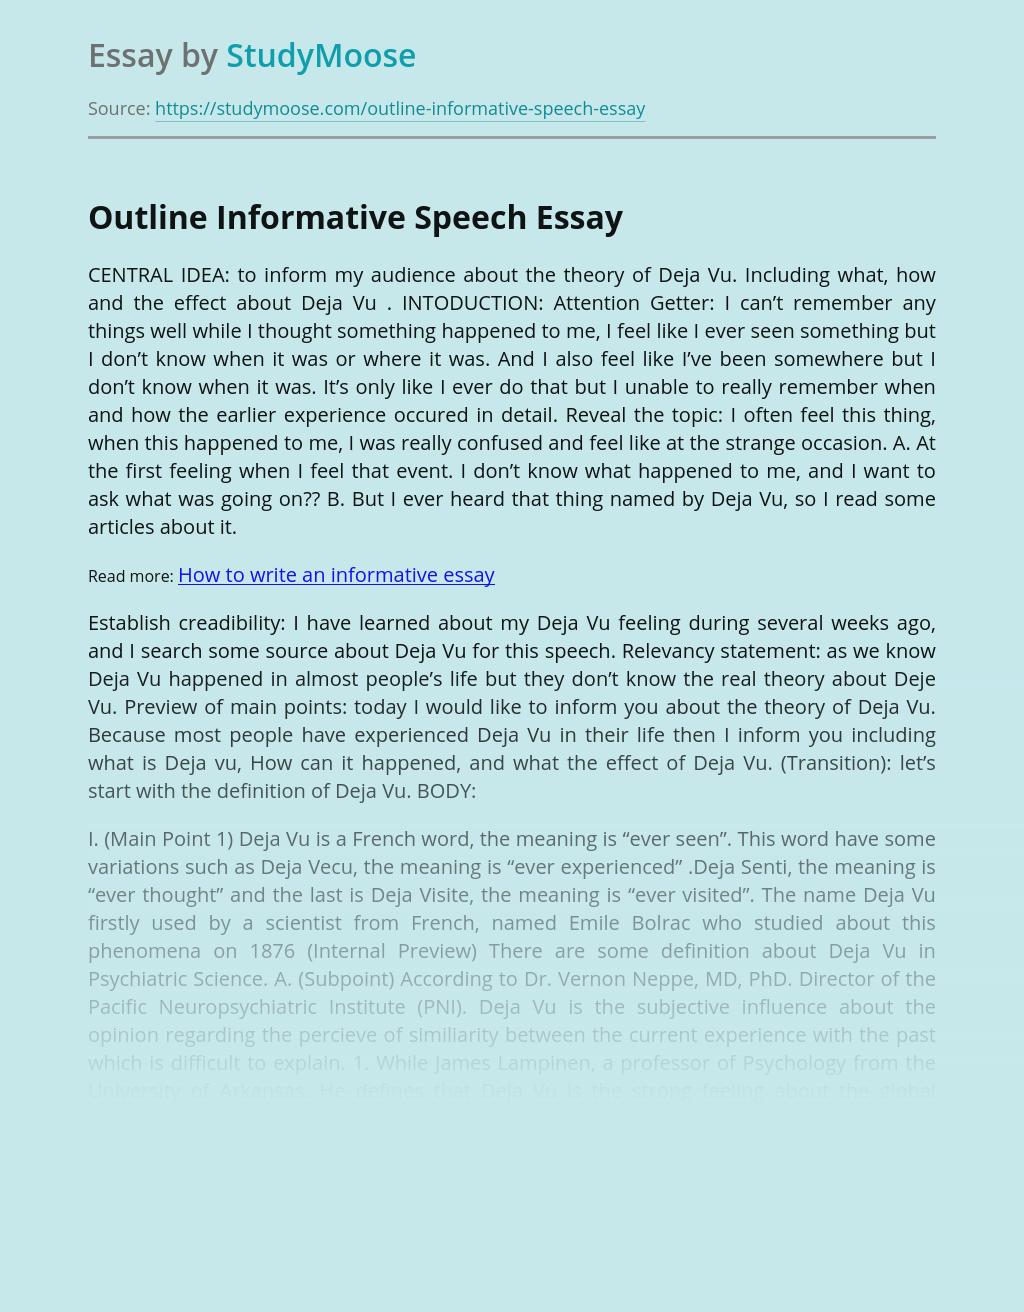 Outline Informative Speech on Deja Vu and Memories